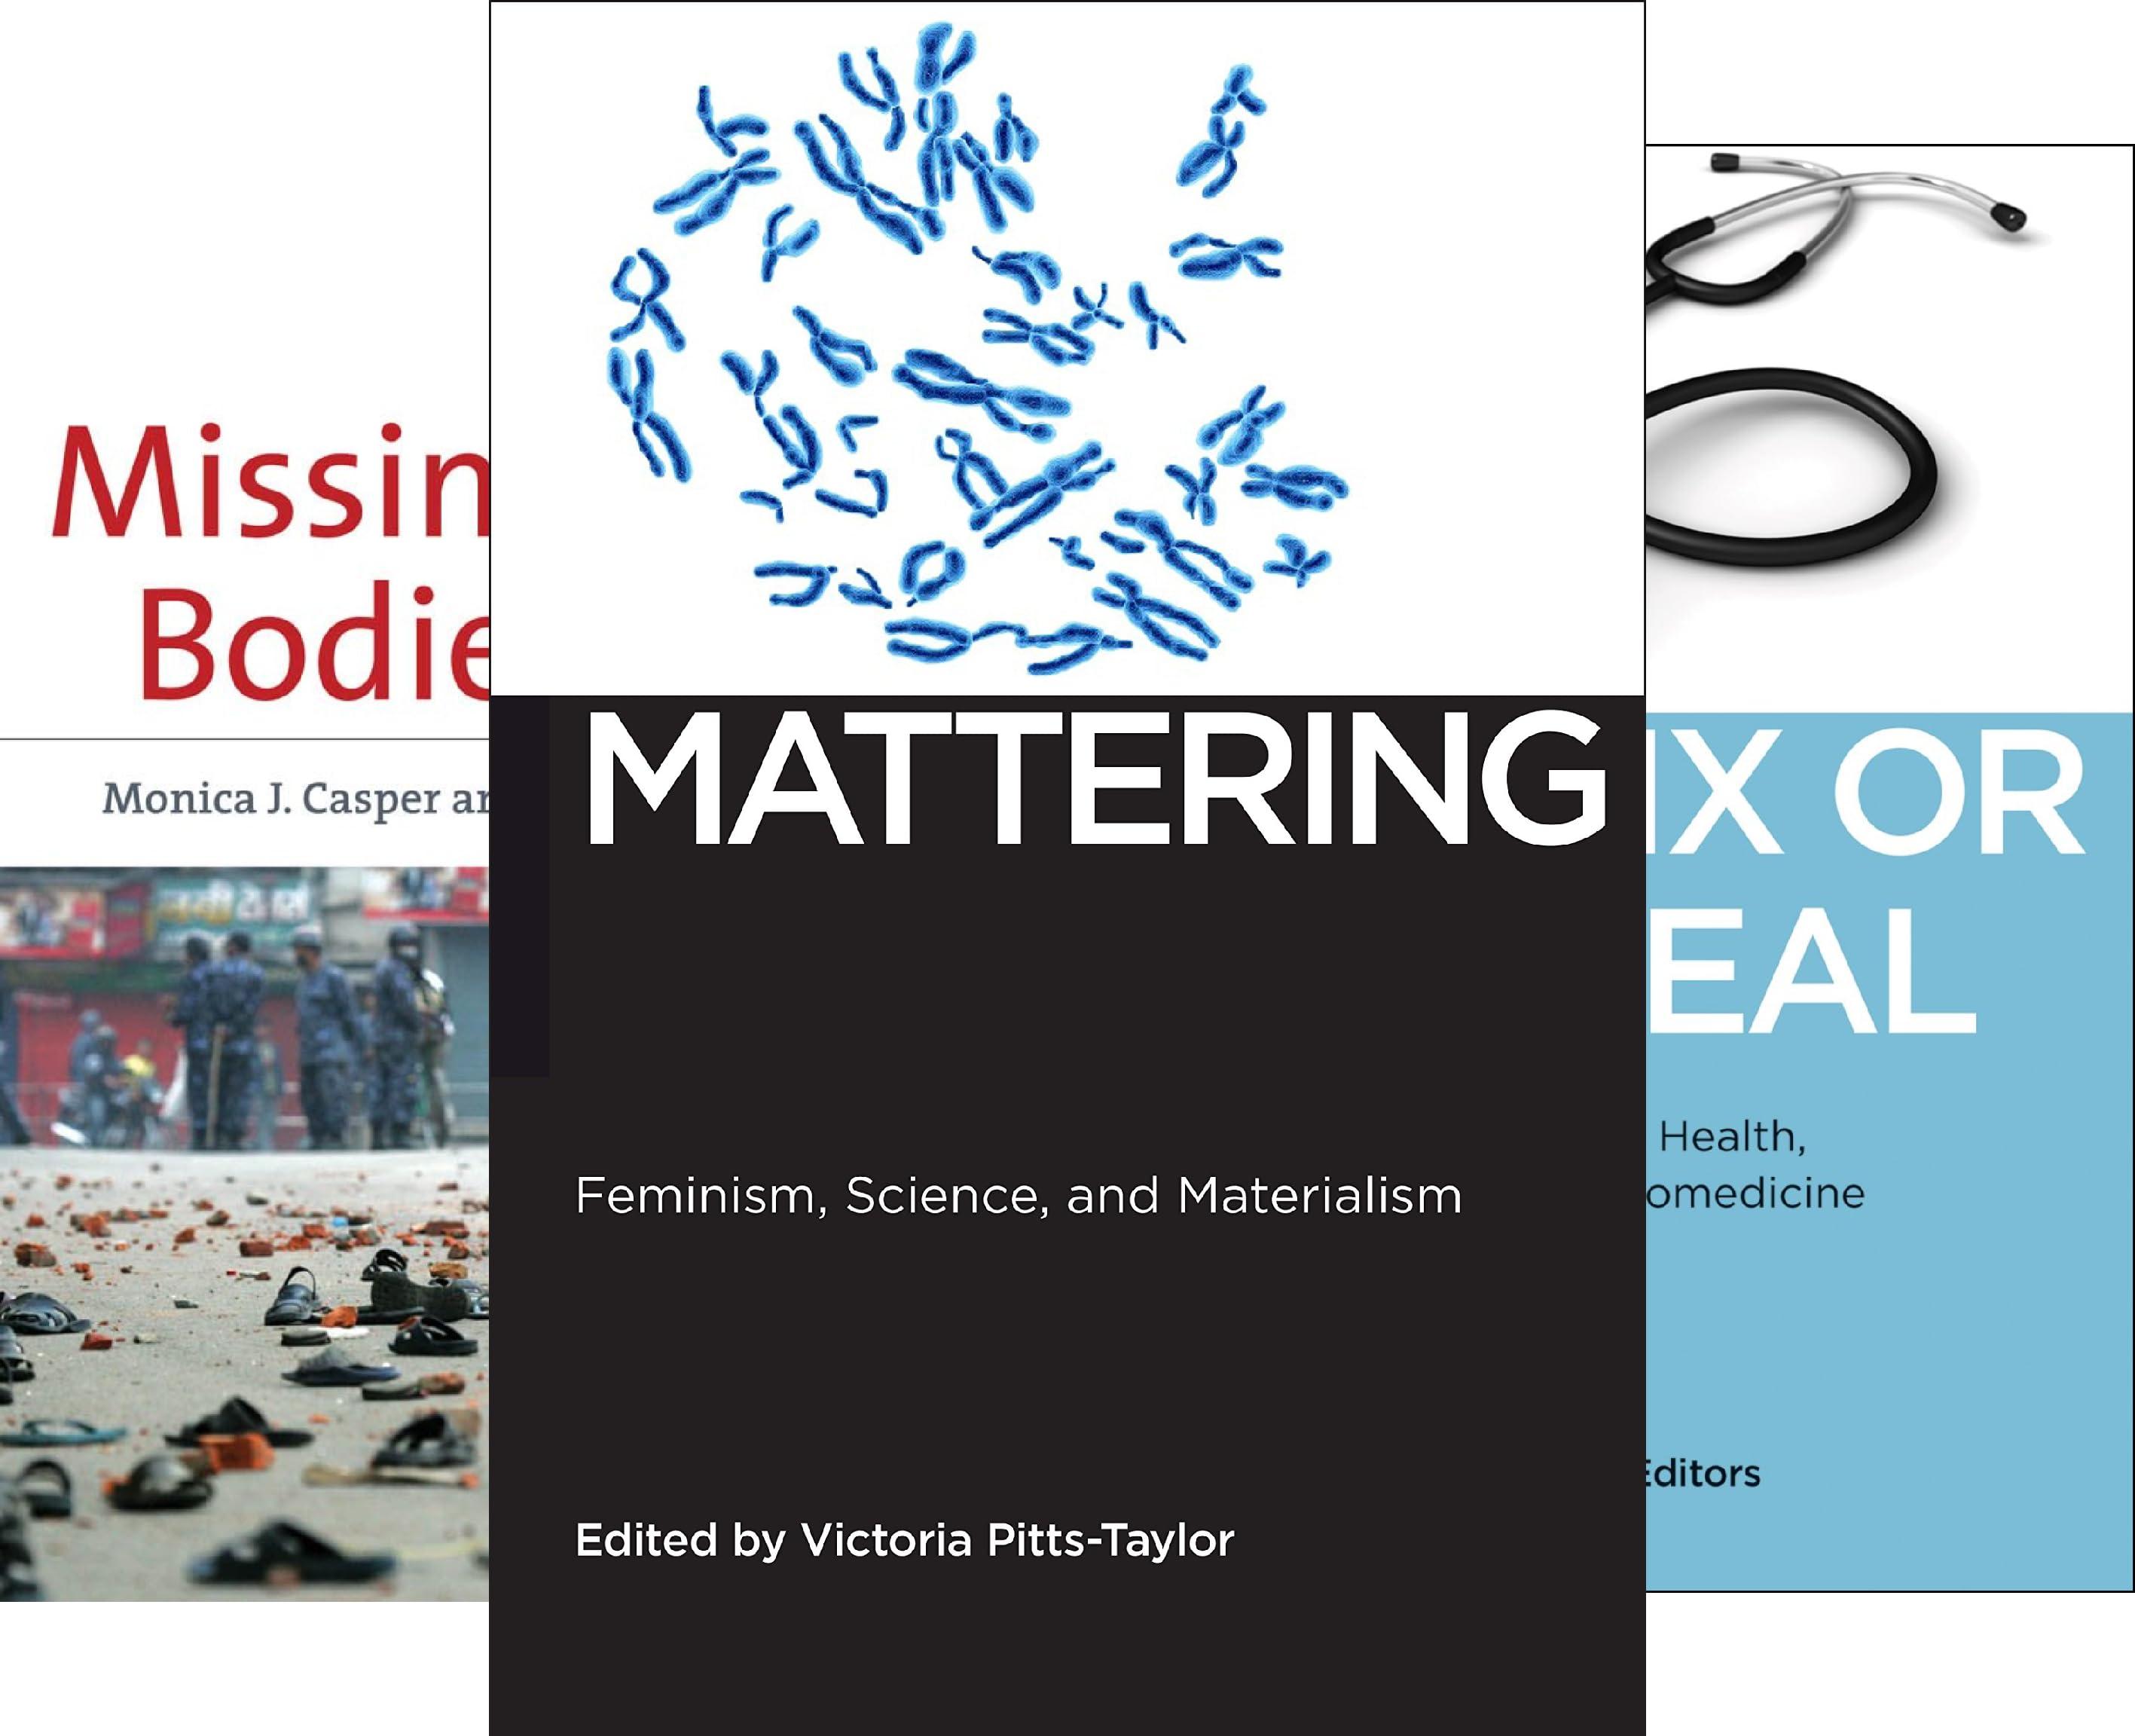 Biopolitics 22 Book Series product image